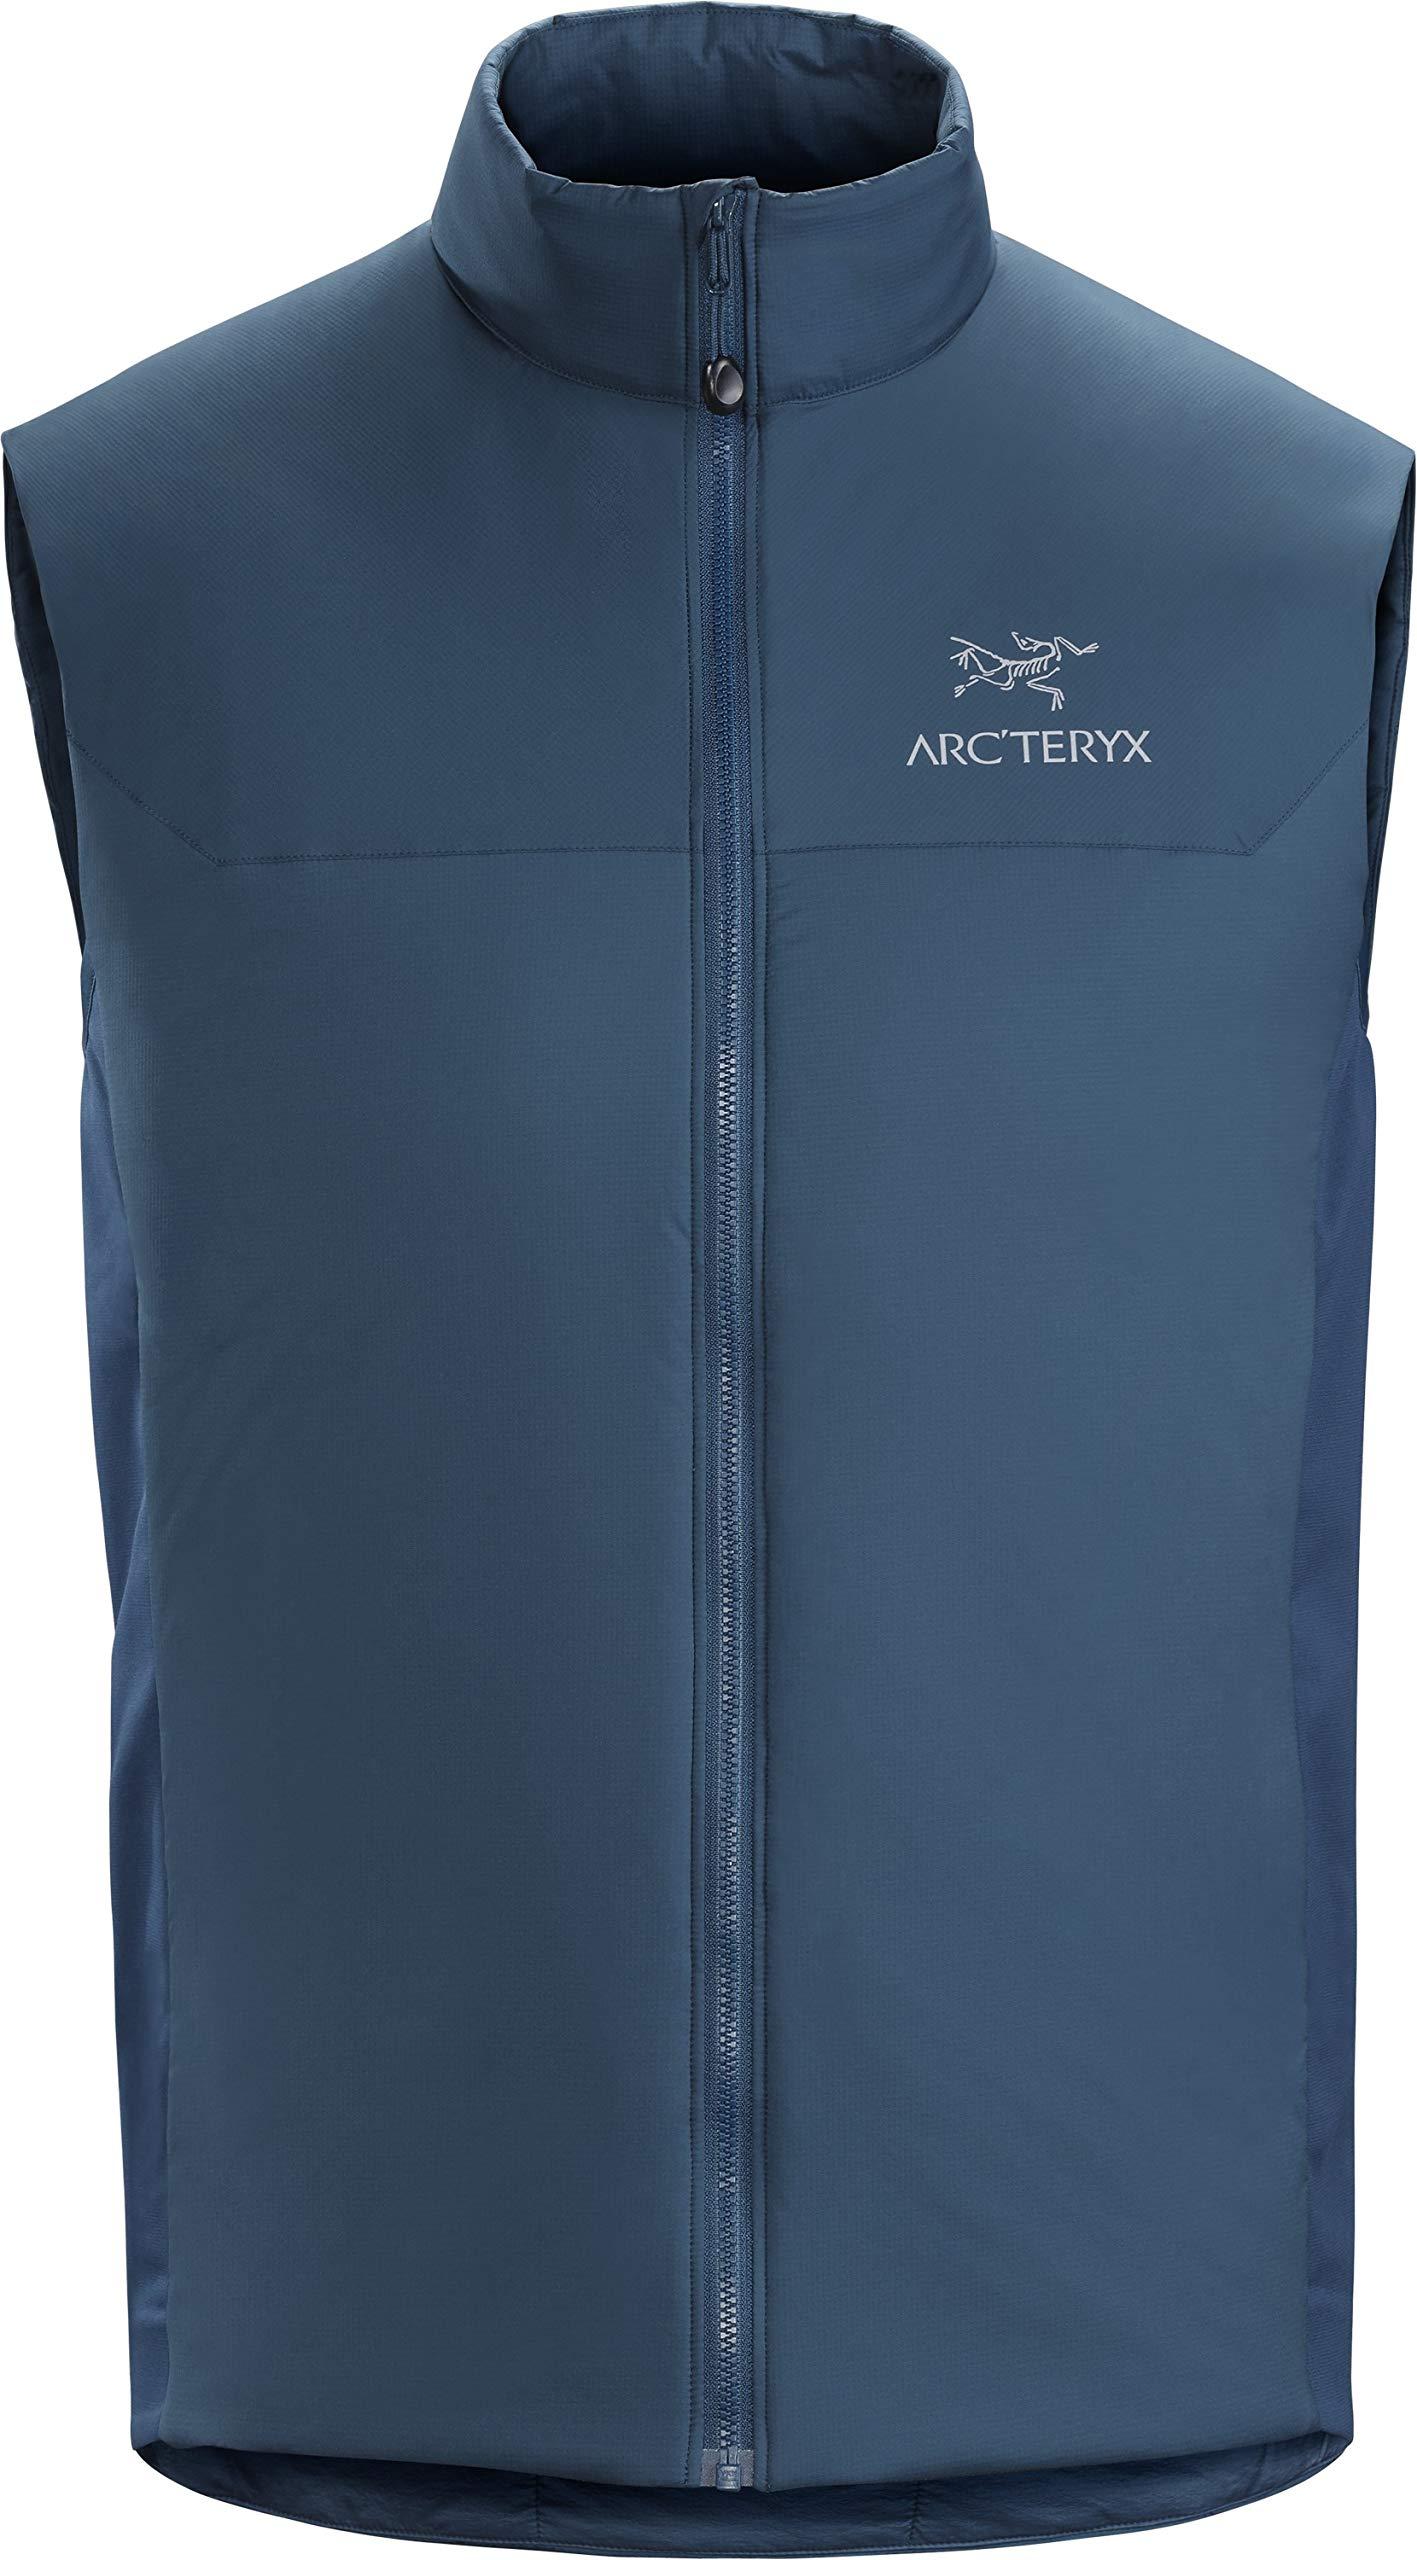 Arc'teryx Atom LT Vest Men's (Nereus, Large) by Arc'teryx